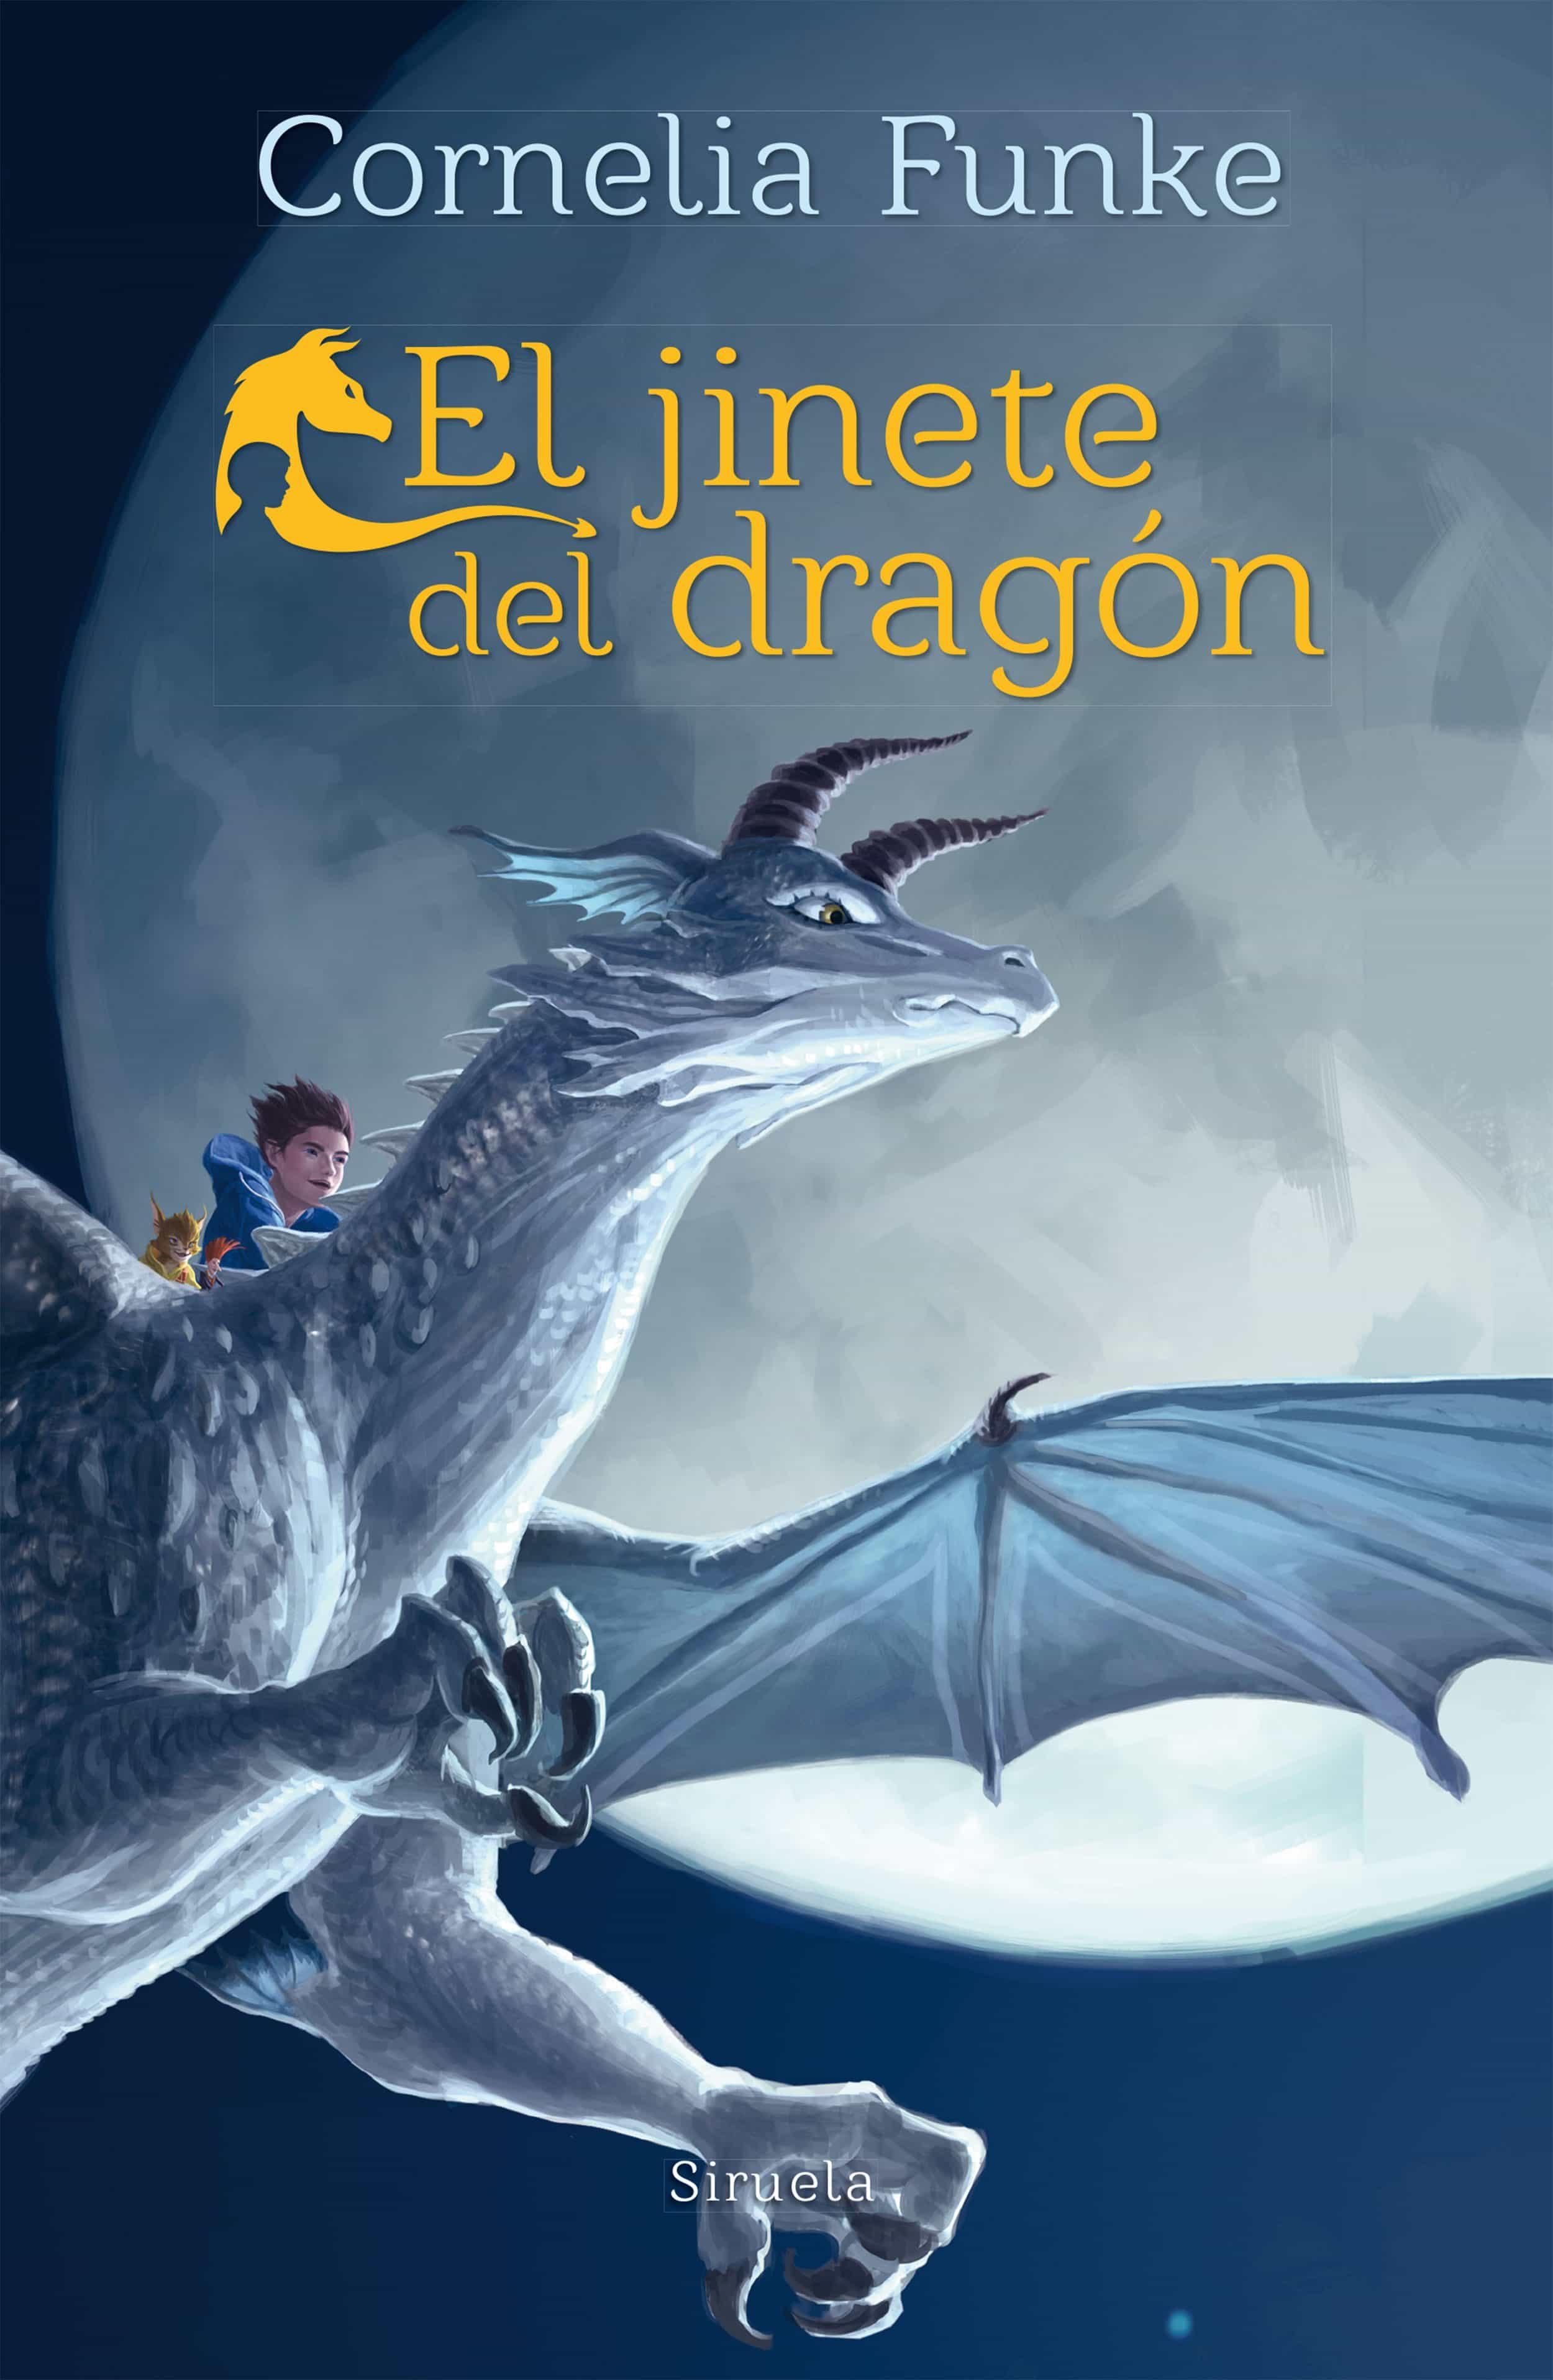 el jinete del dragon-cornelia funke-9788416964826